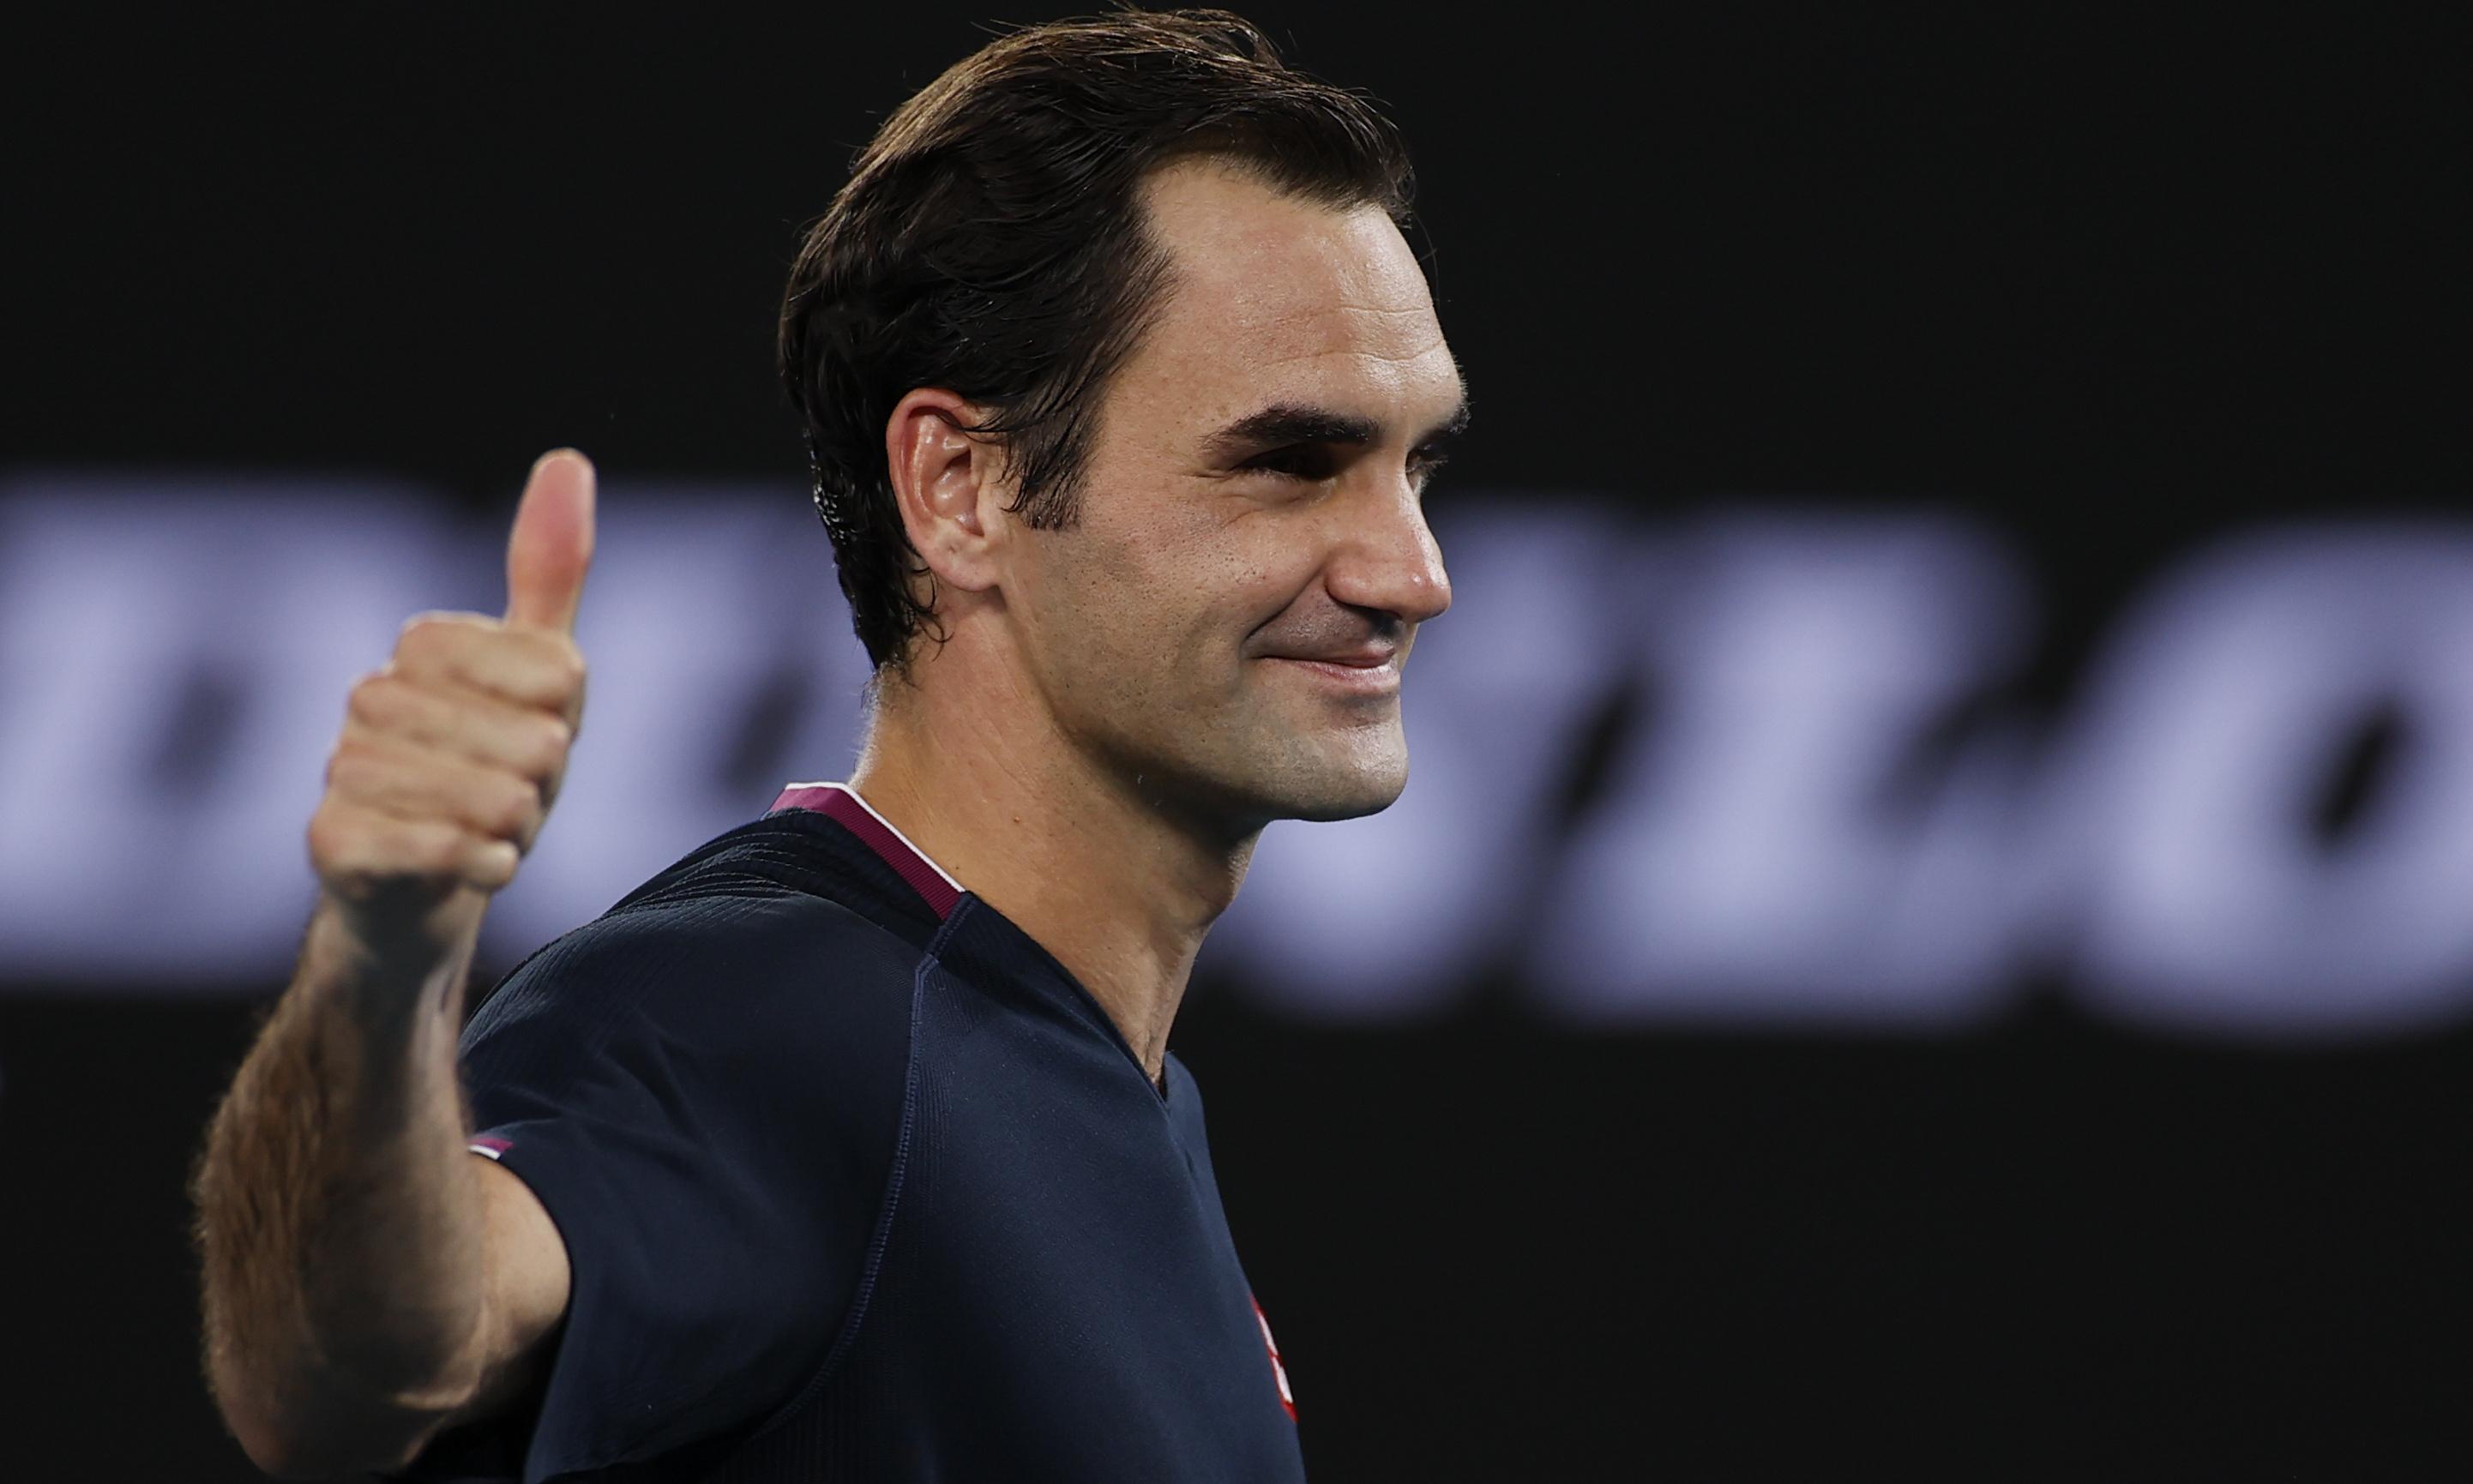 Roger Federer and Novak Djokovic ease into third round of Australian Open